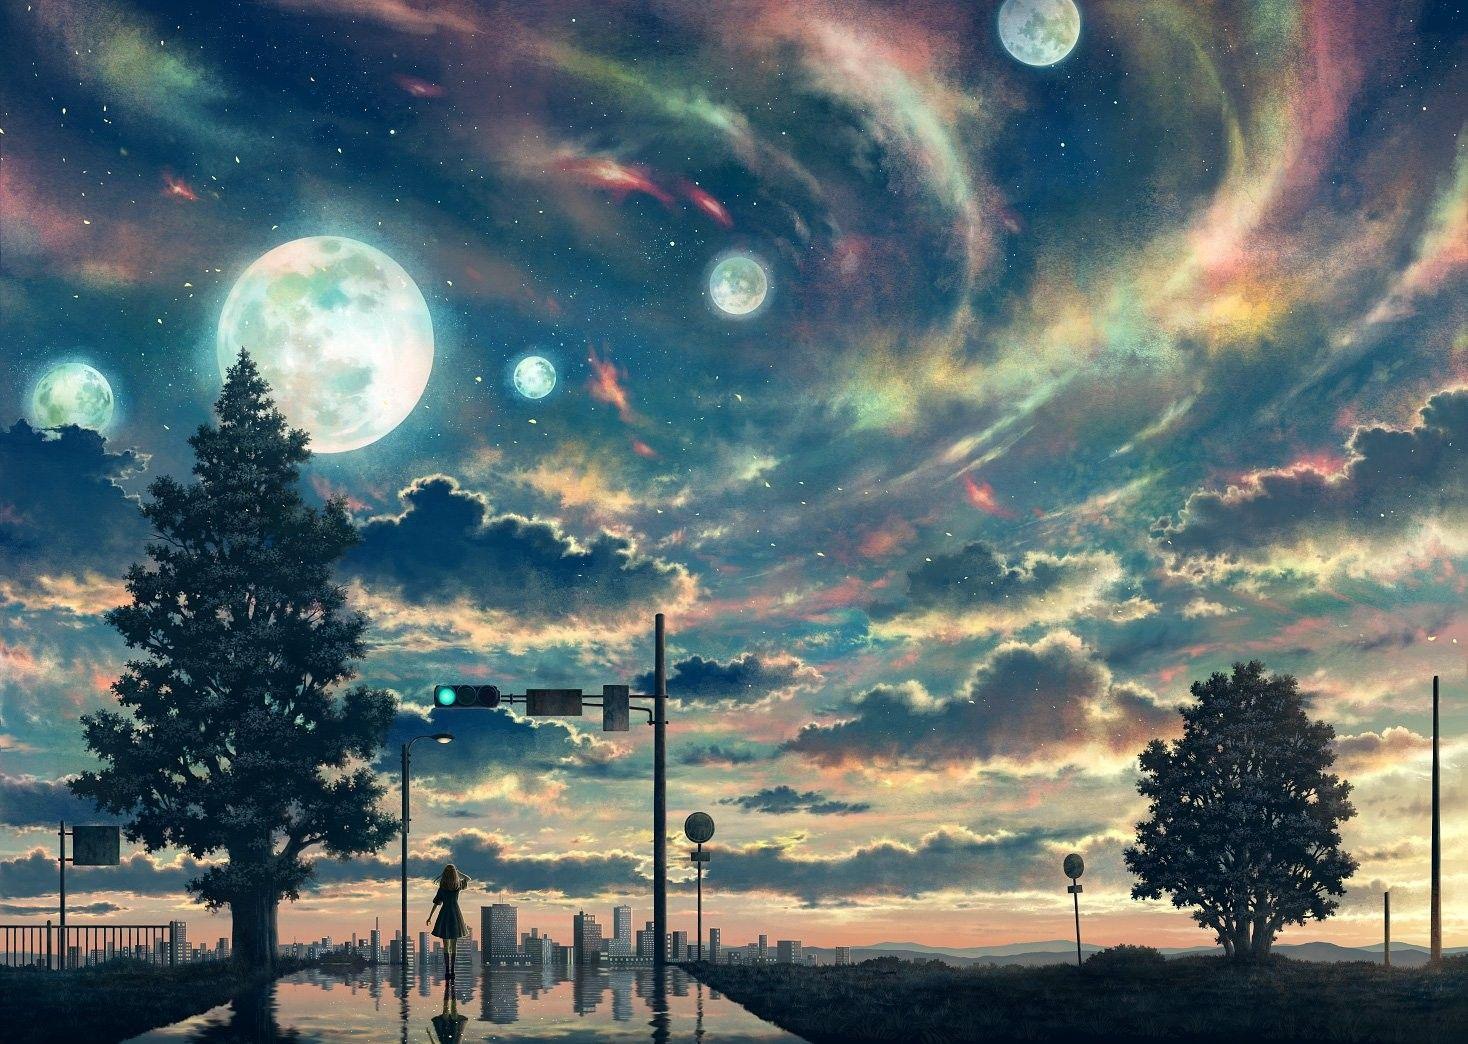 Anime Sky Wallpapers Art Image Nature View Beautiful Kurdishotaku Animeart Wallpaper Sunset Animewallpaper Sky Anime Anime Wallpaper Beautiful Sky